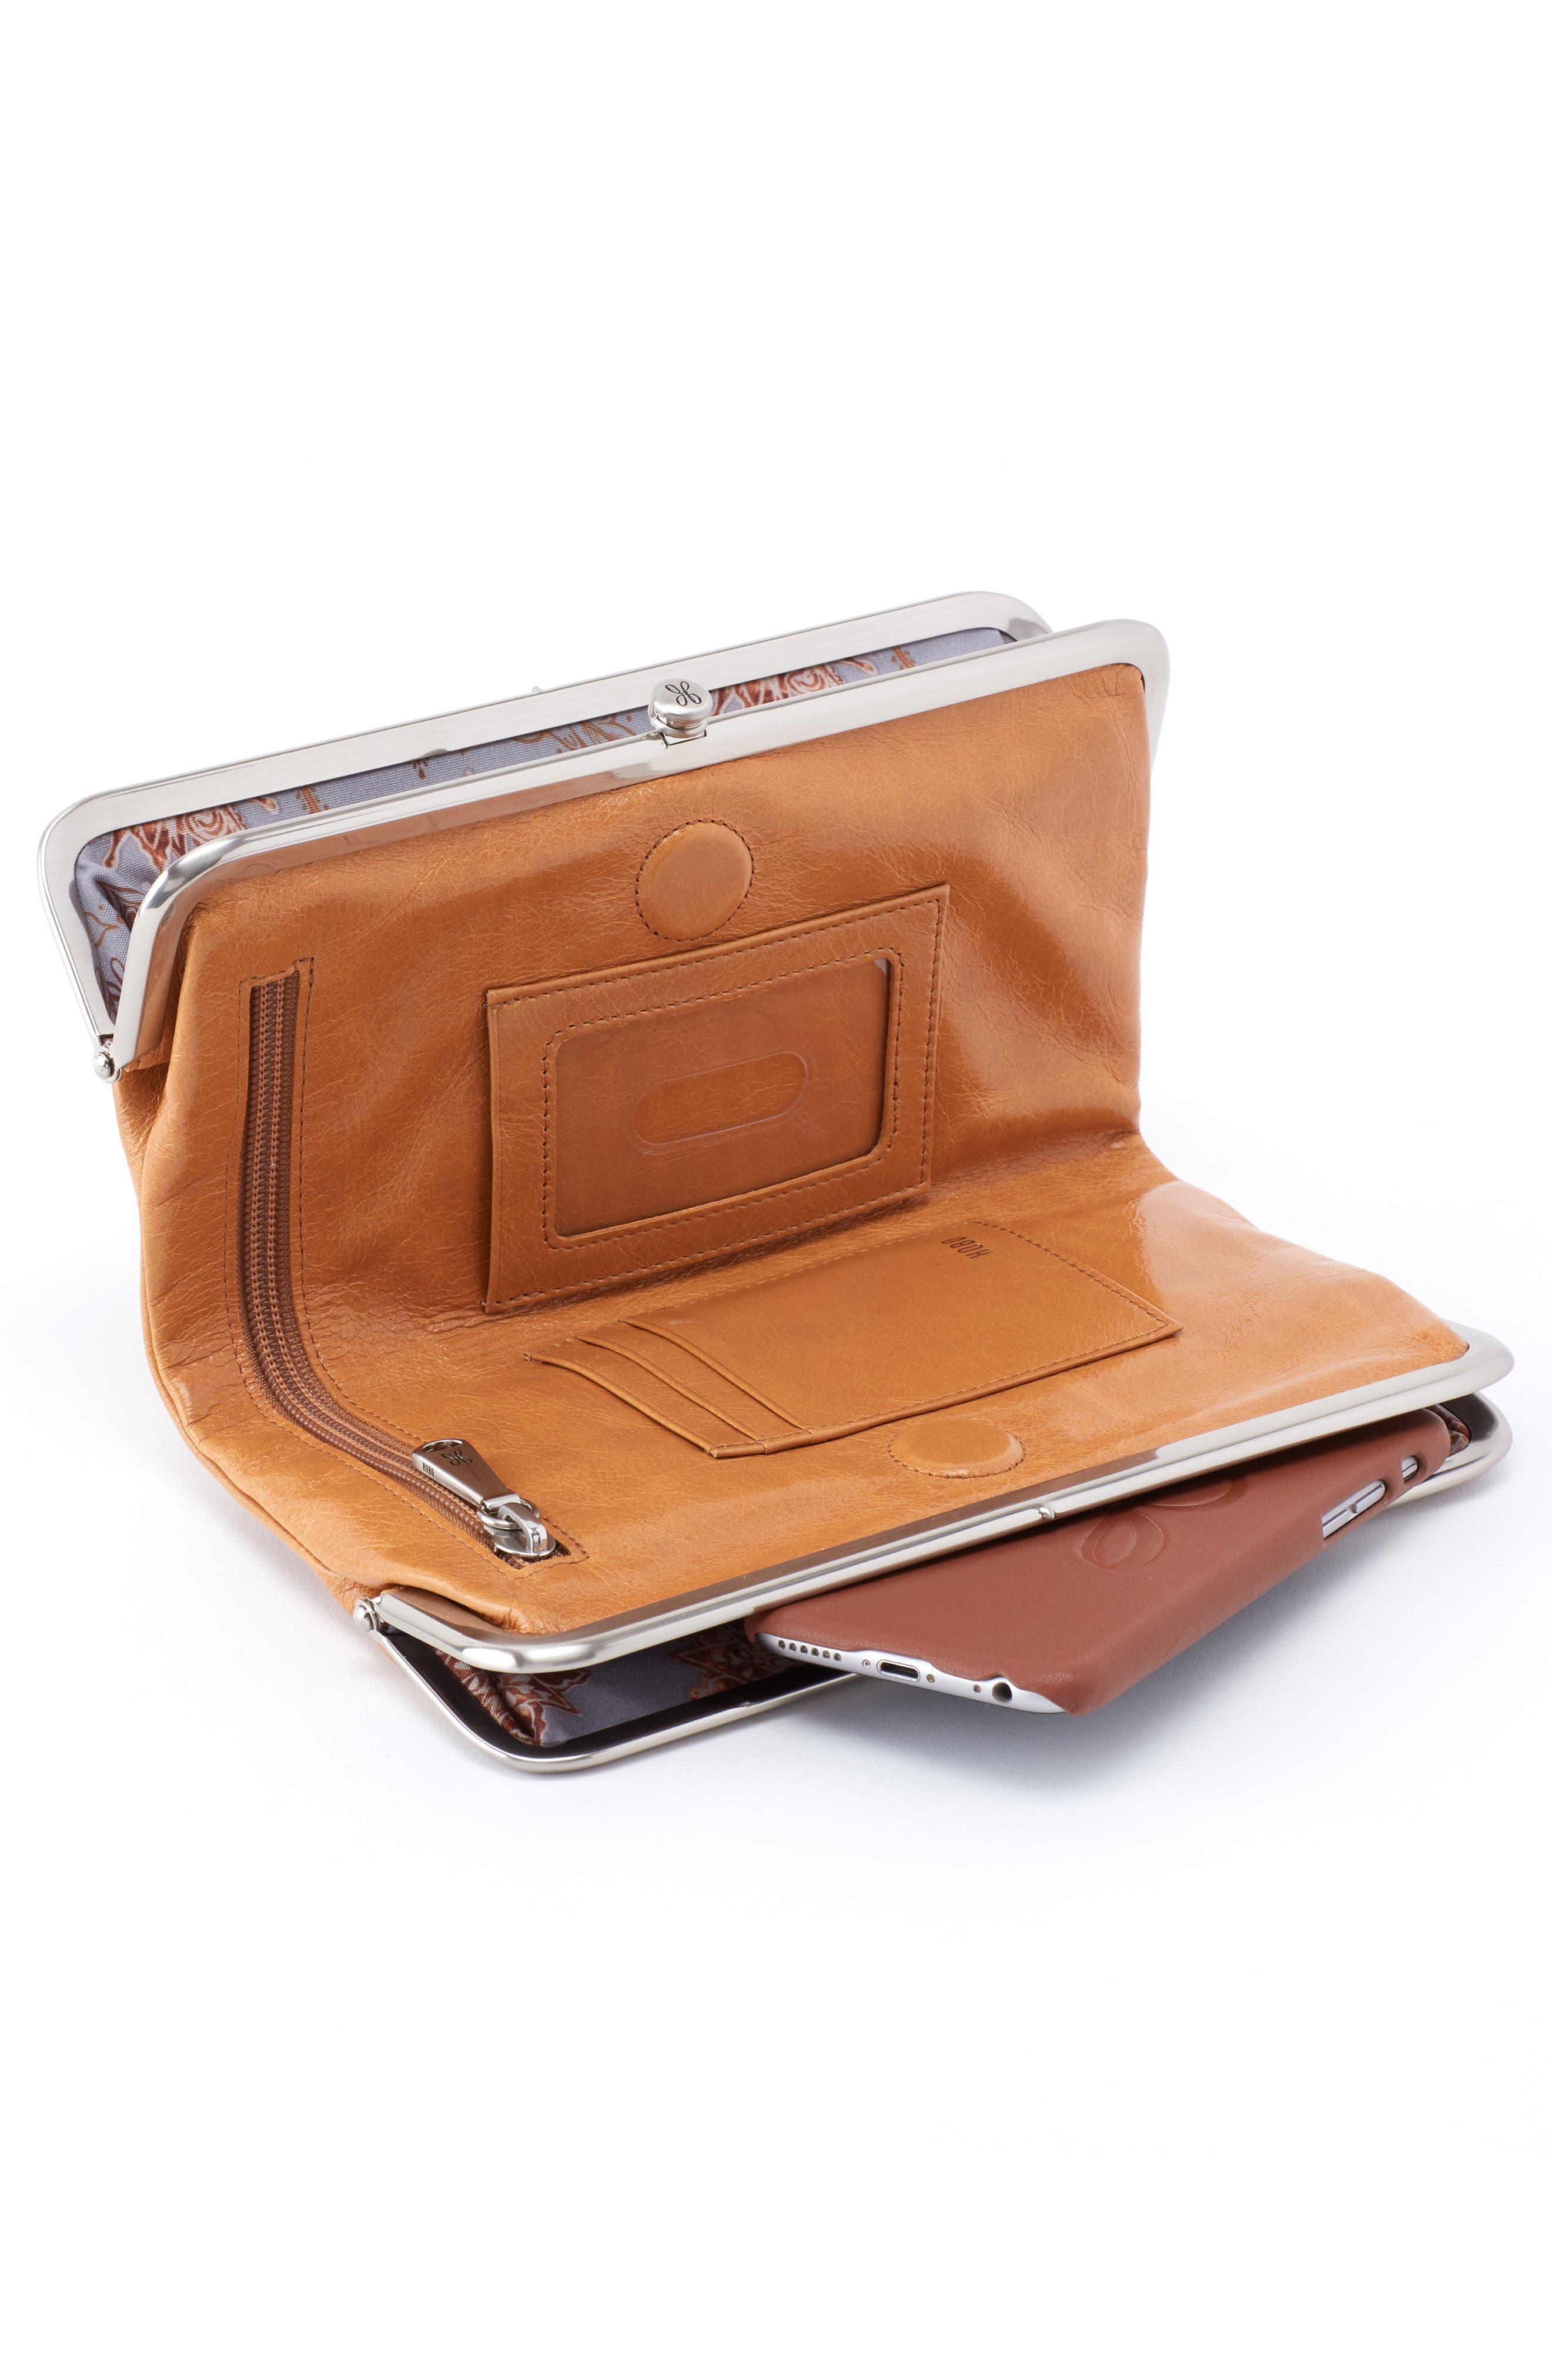 1b9763386d1 Handbags, Purses & Wallets | Nordstrom